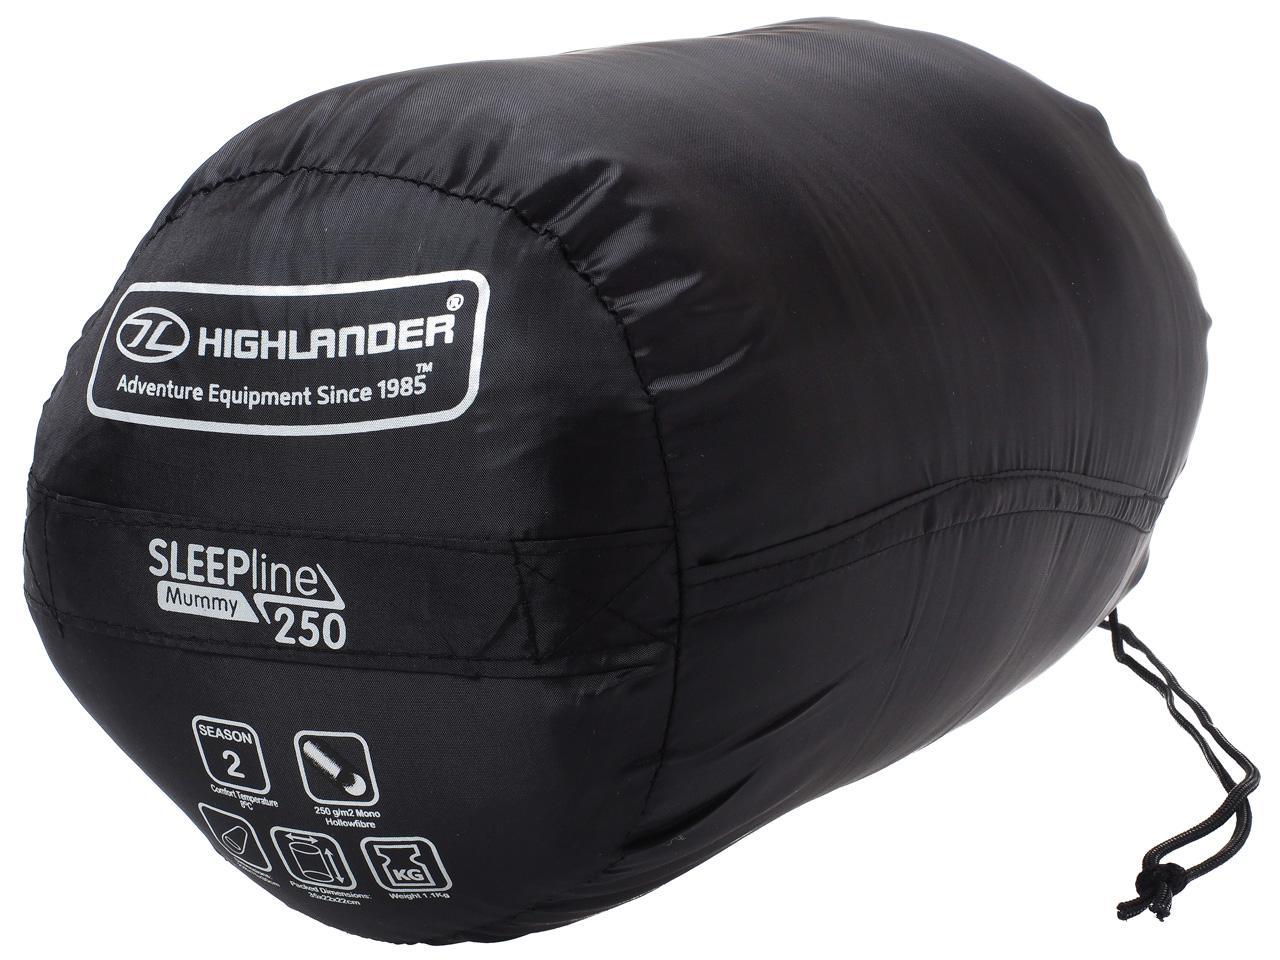 Sac-de-couchage-sarcophage-Highlander-Sleepin-250-nr-5-8-15-Noir-41445-Neuf